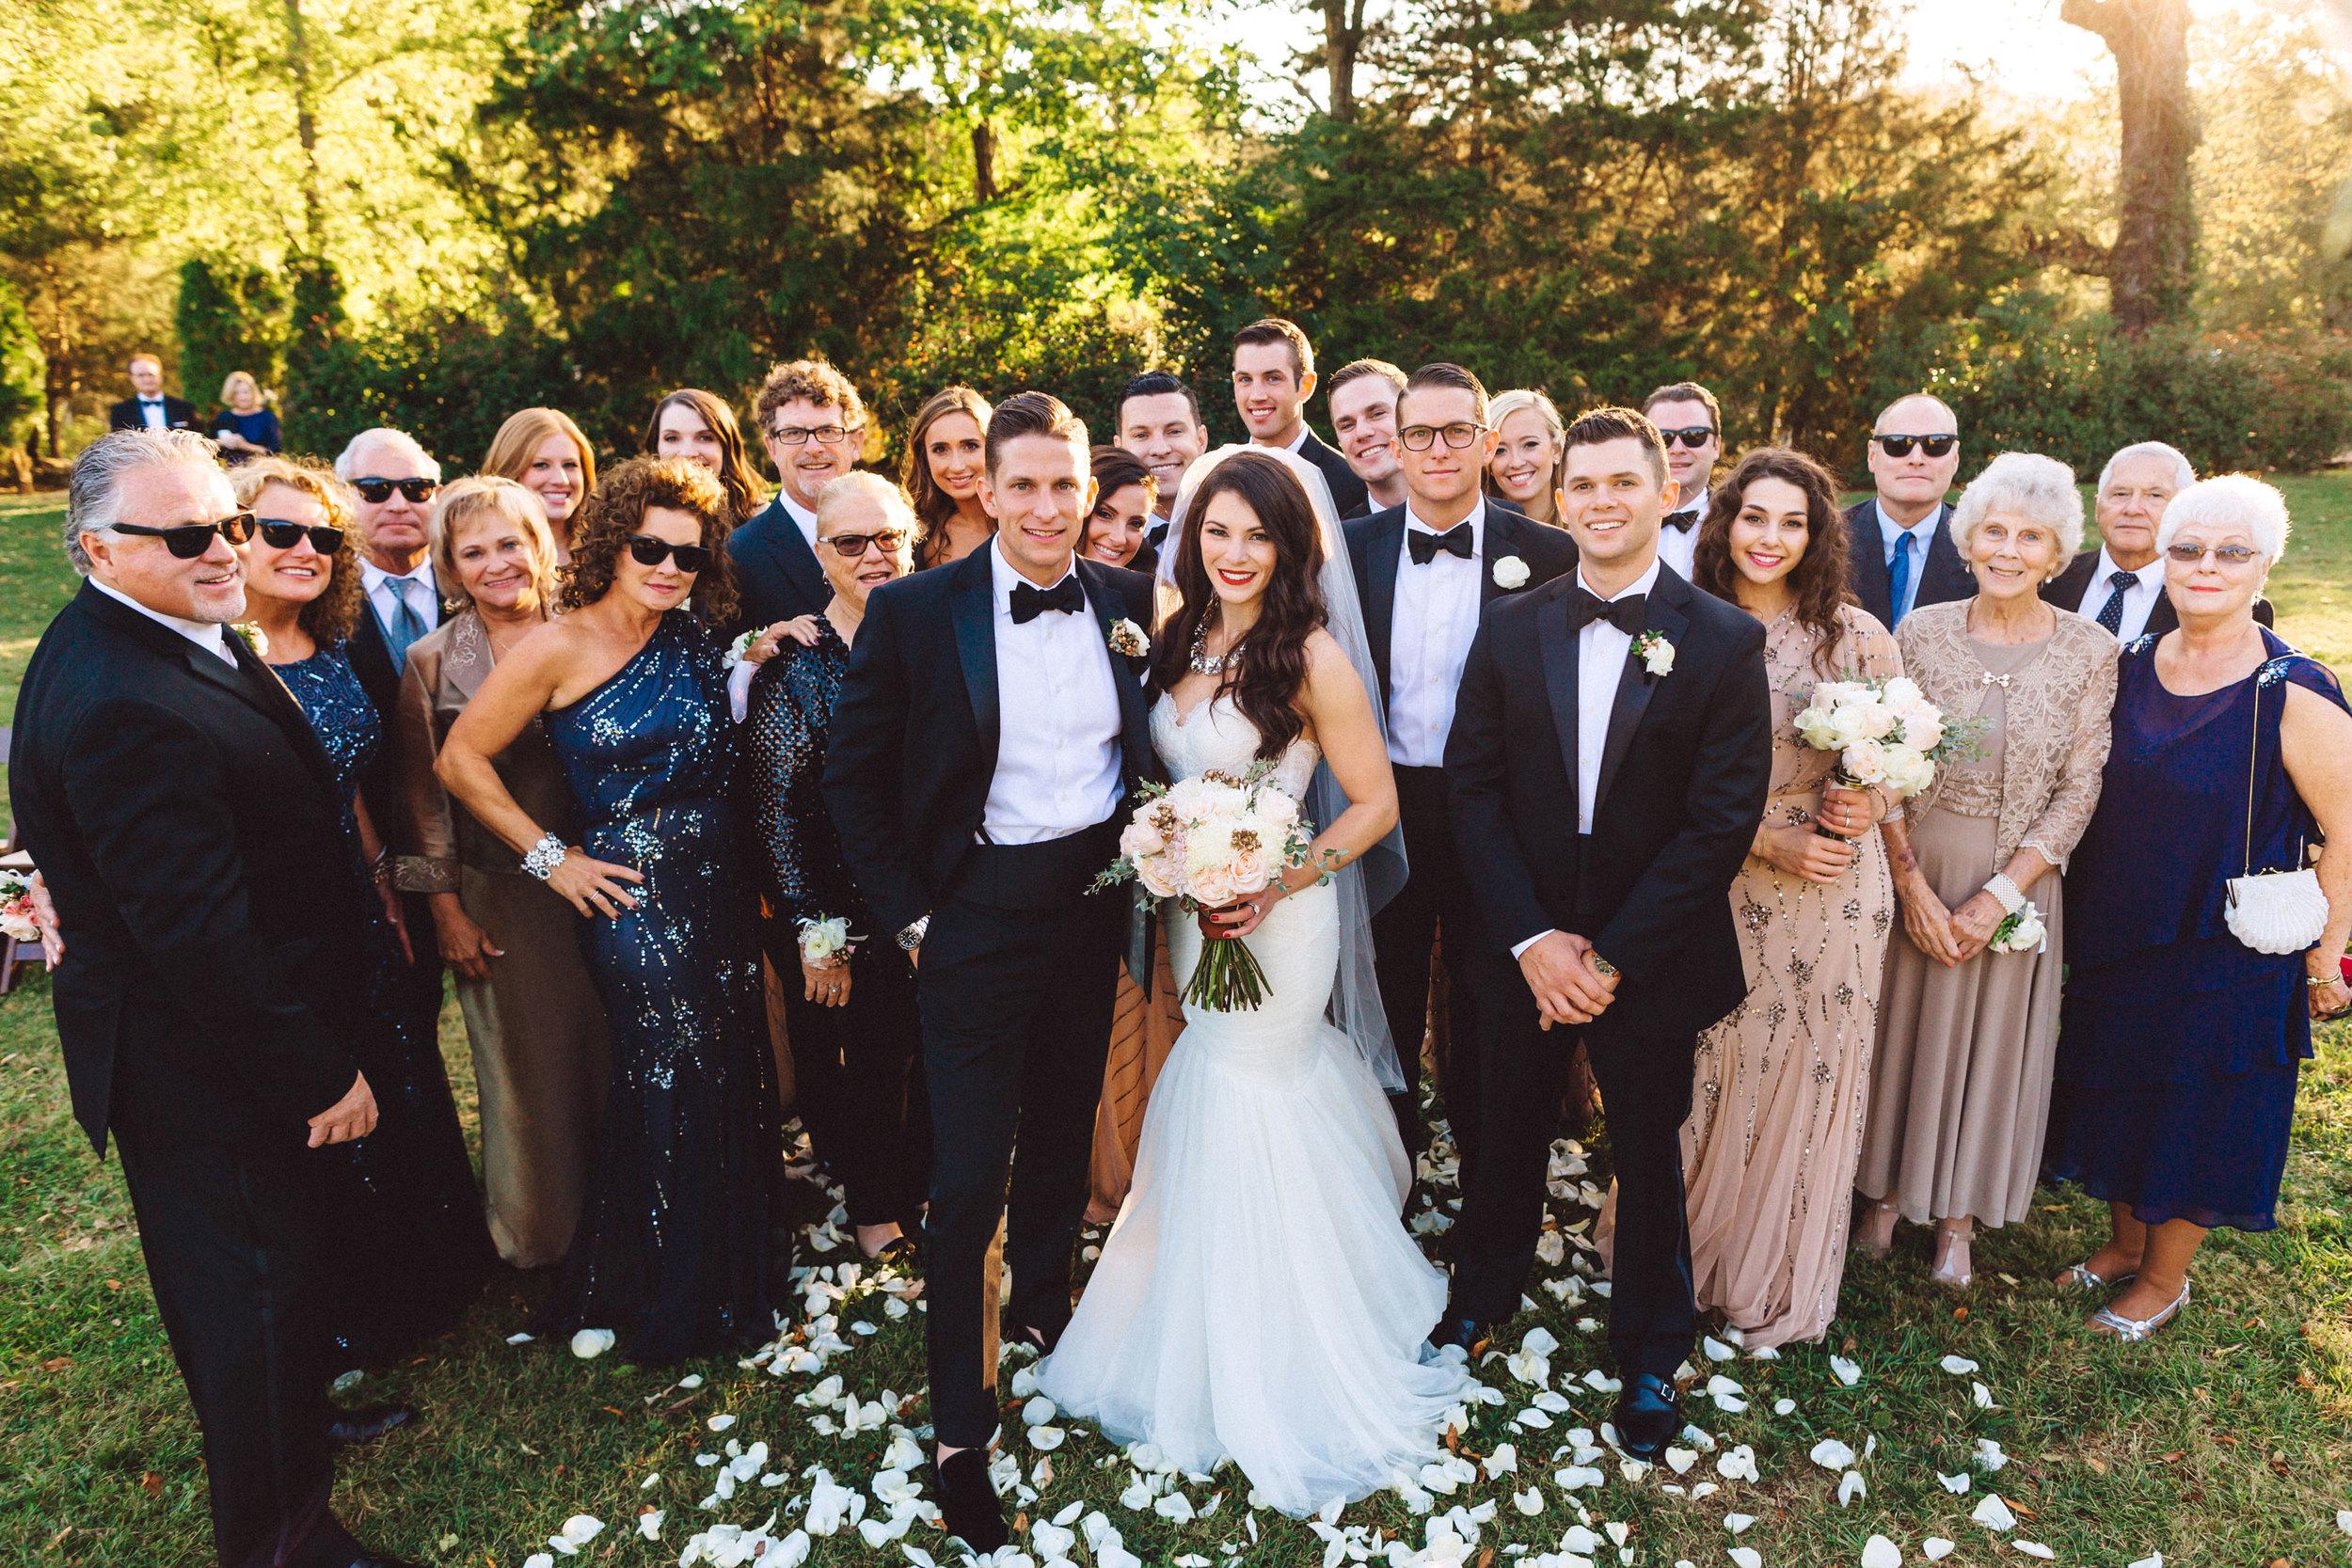 Me & Mr. Jones Wedding, Black Tie Wedding, Bridesmaids wearing Adrianna Papell Beaded Dresses, Embellished Bridesmaids Dresses, Black Tie Wedding in Nashville, Informal Family Wedding Photo